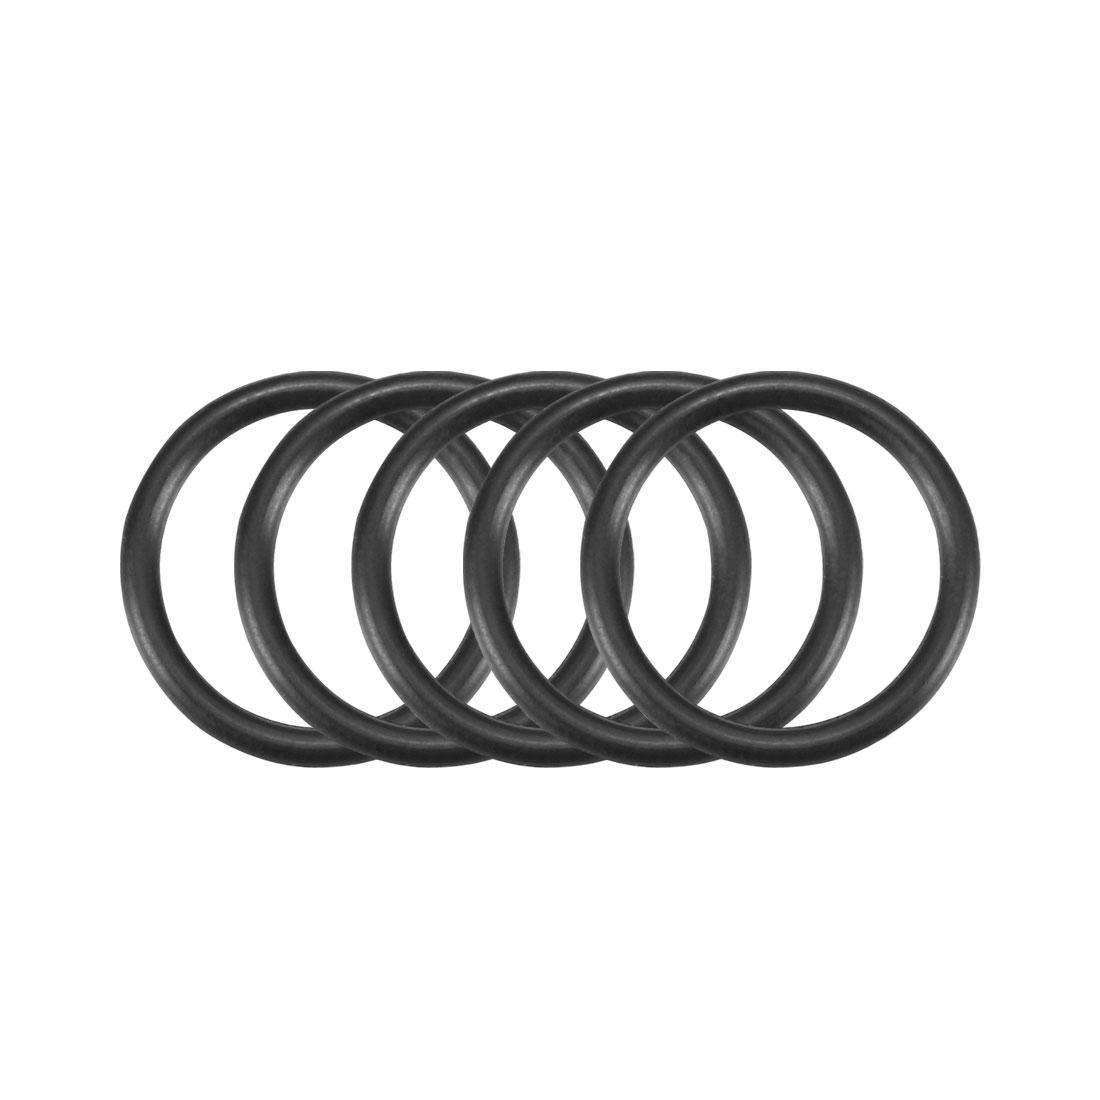 50Pcs Black 15mmx1.5mm Nitrile Rubber O Ring NBR Oil Resistant Sealing Grommets